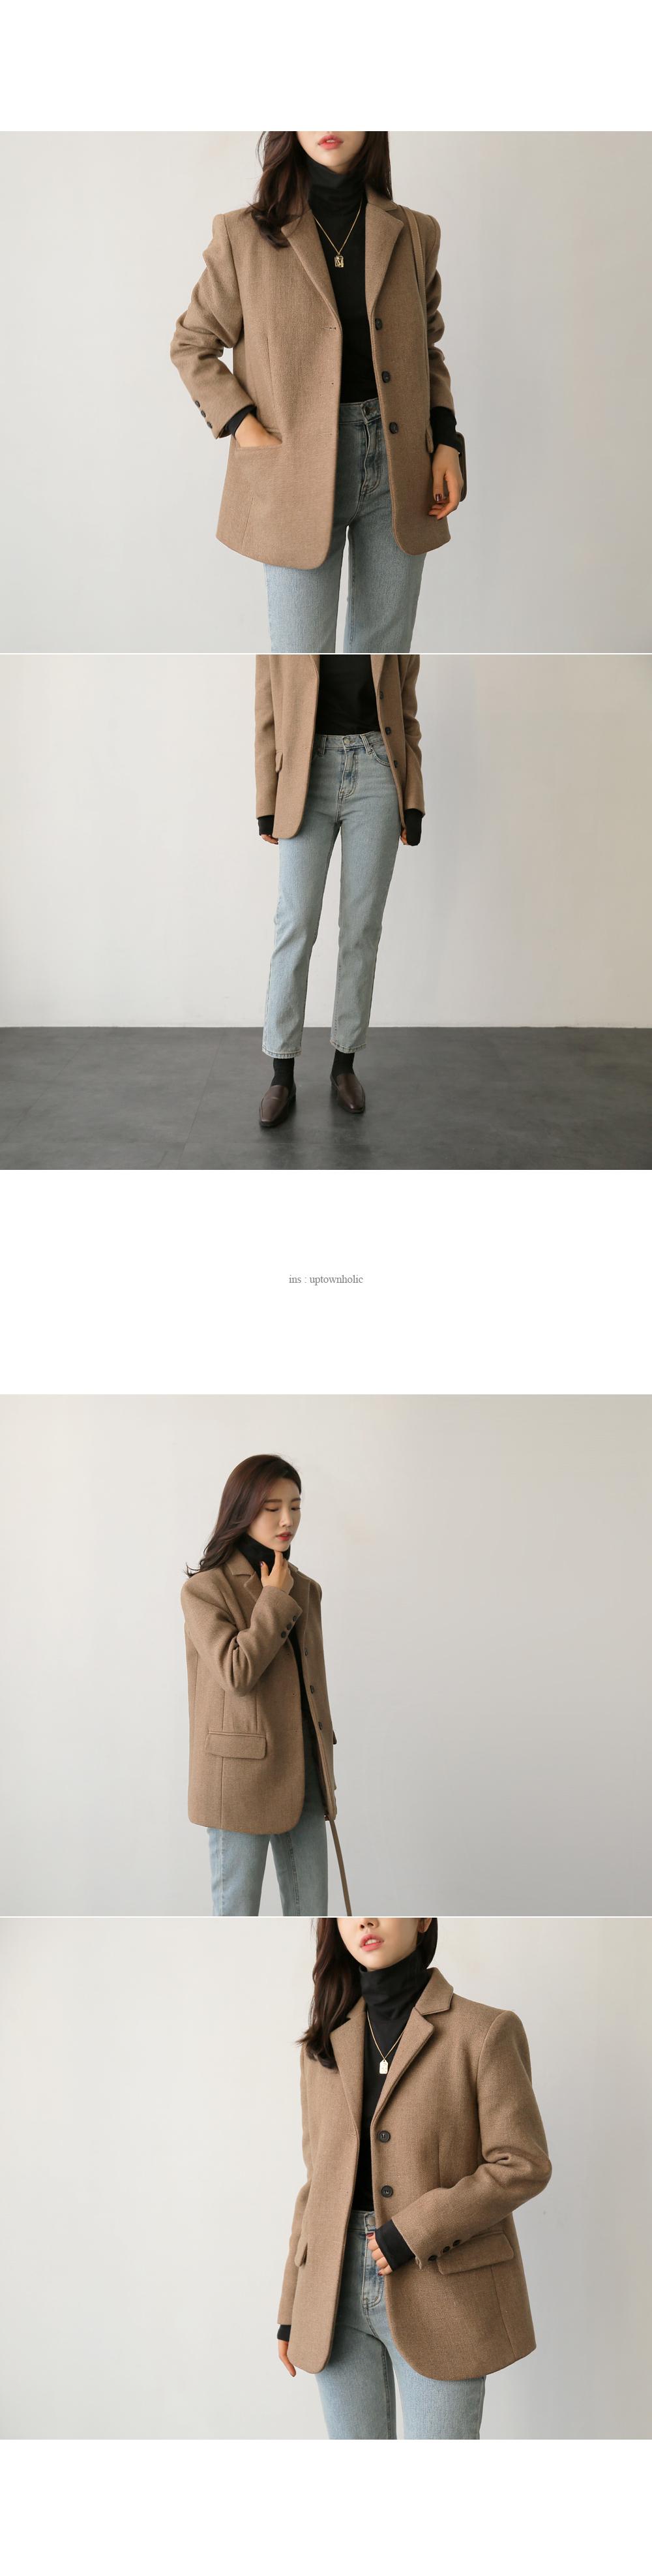 Sepia shoes black 225,250 / brown 235